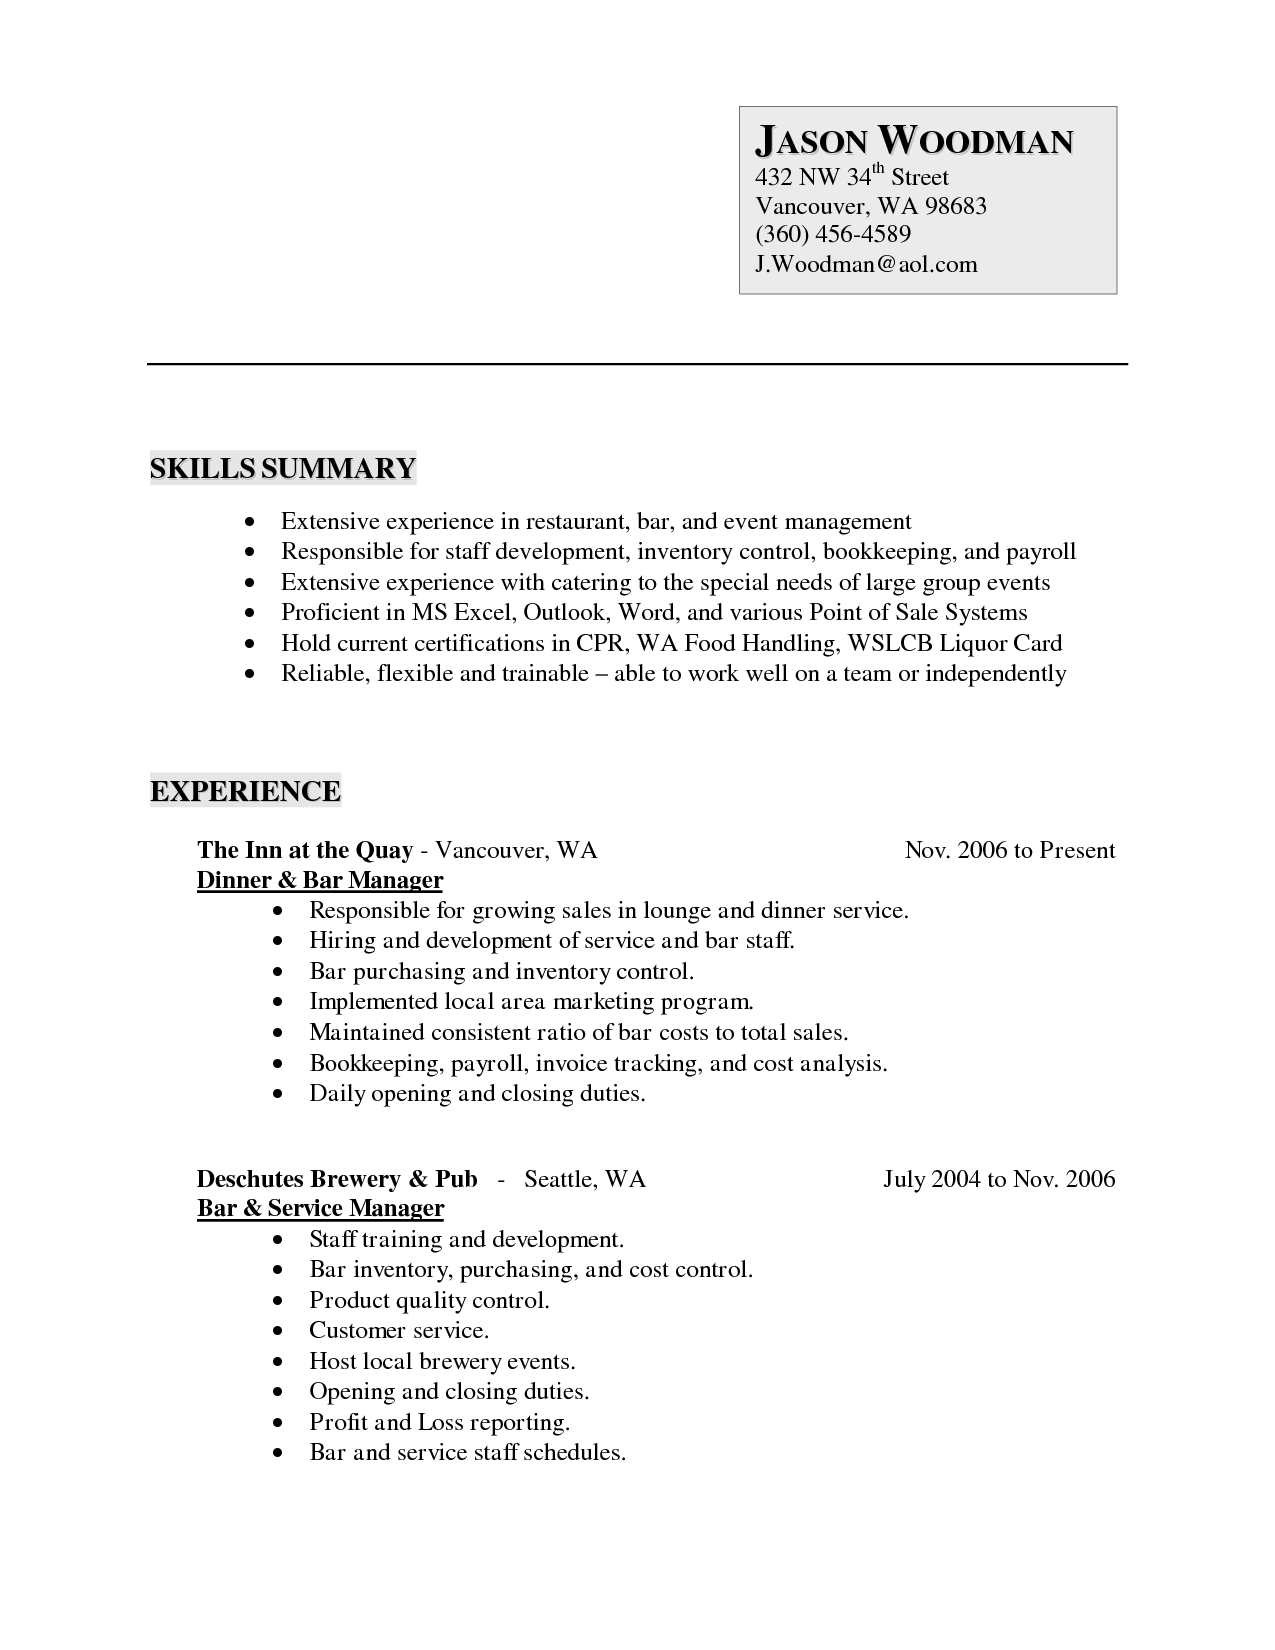 Letter Examples Volunteer Positionvolunteer Work On Resume